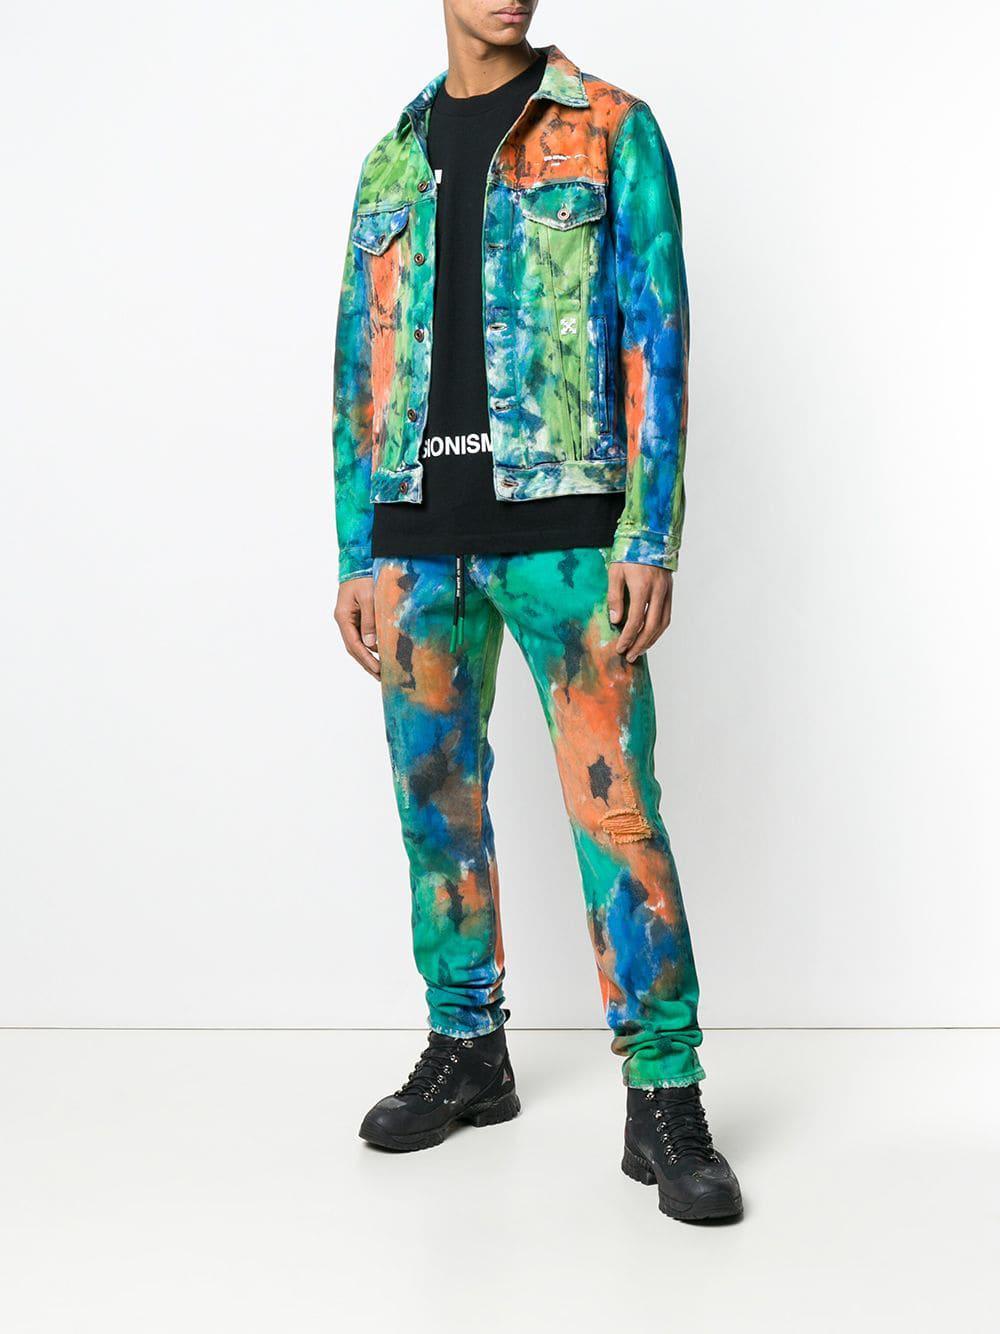 dd66483a3db Lyst - Off-White c o Virgil Abloh Paint Splattered Jeans in Blue for Men